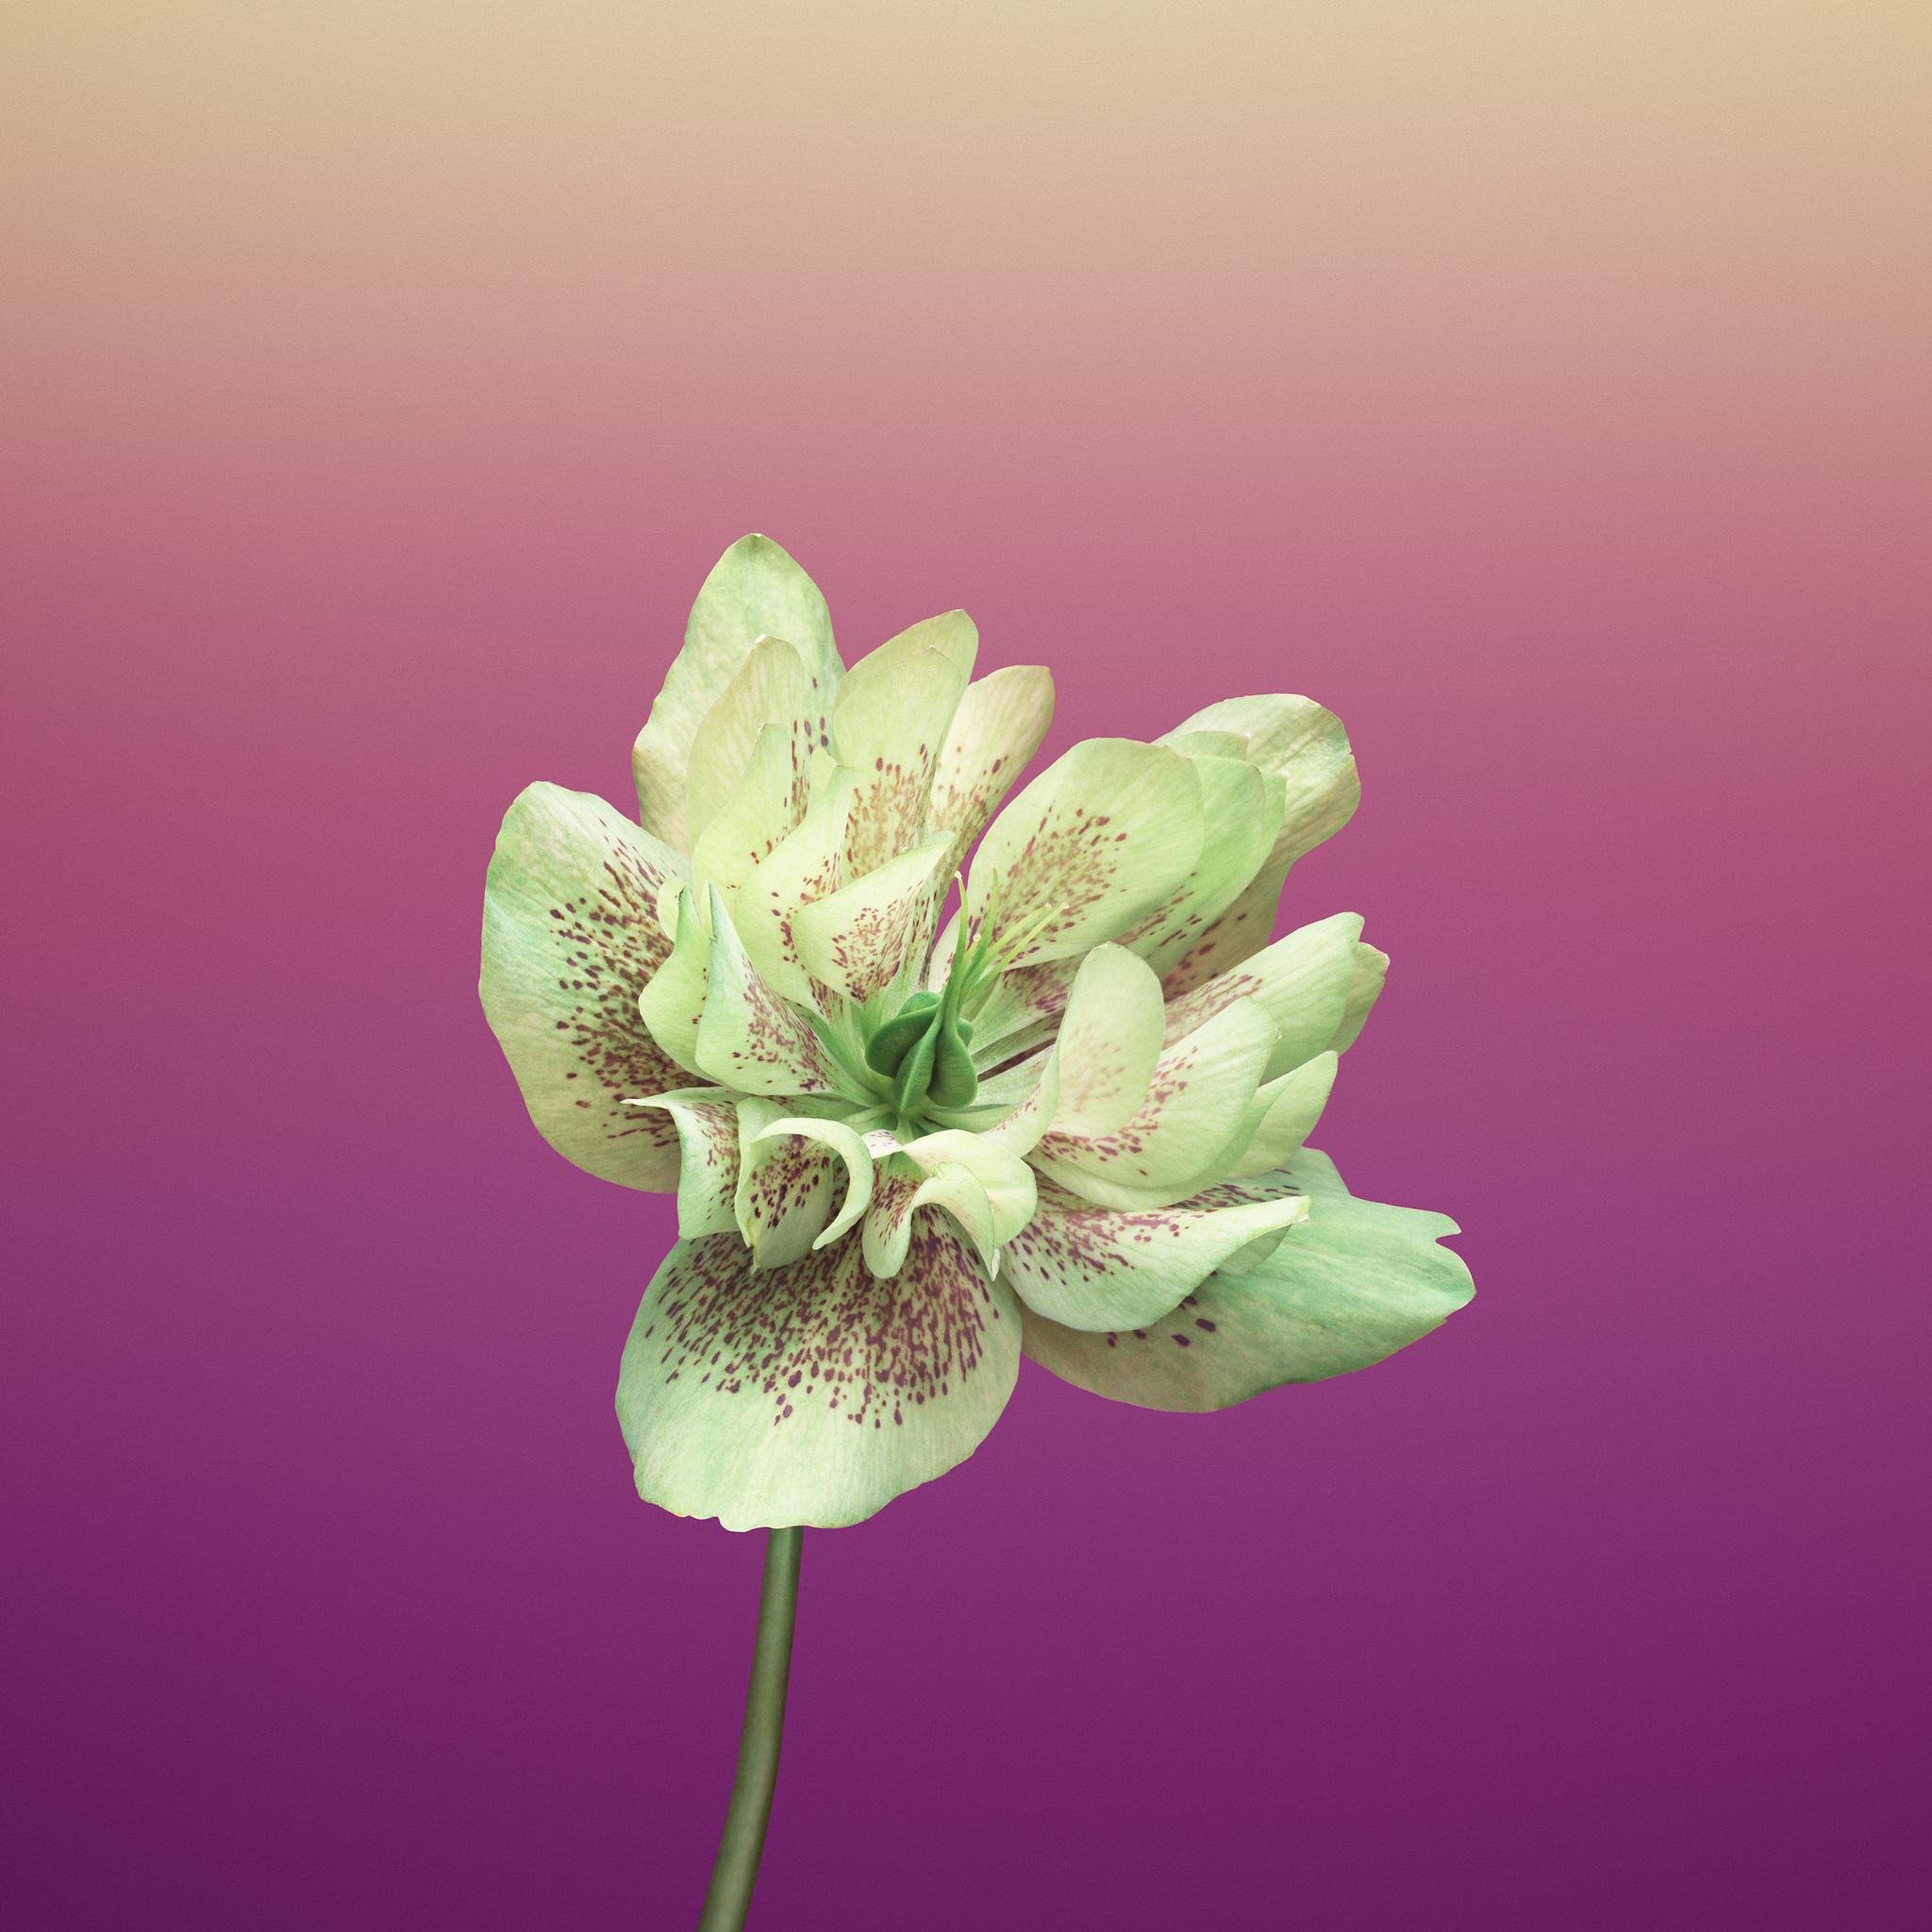 ios-11-flower-helleborus-7x.jpg